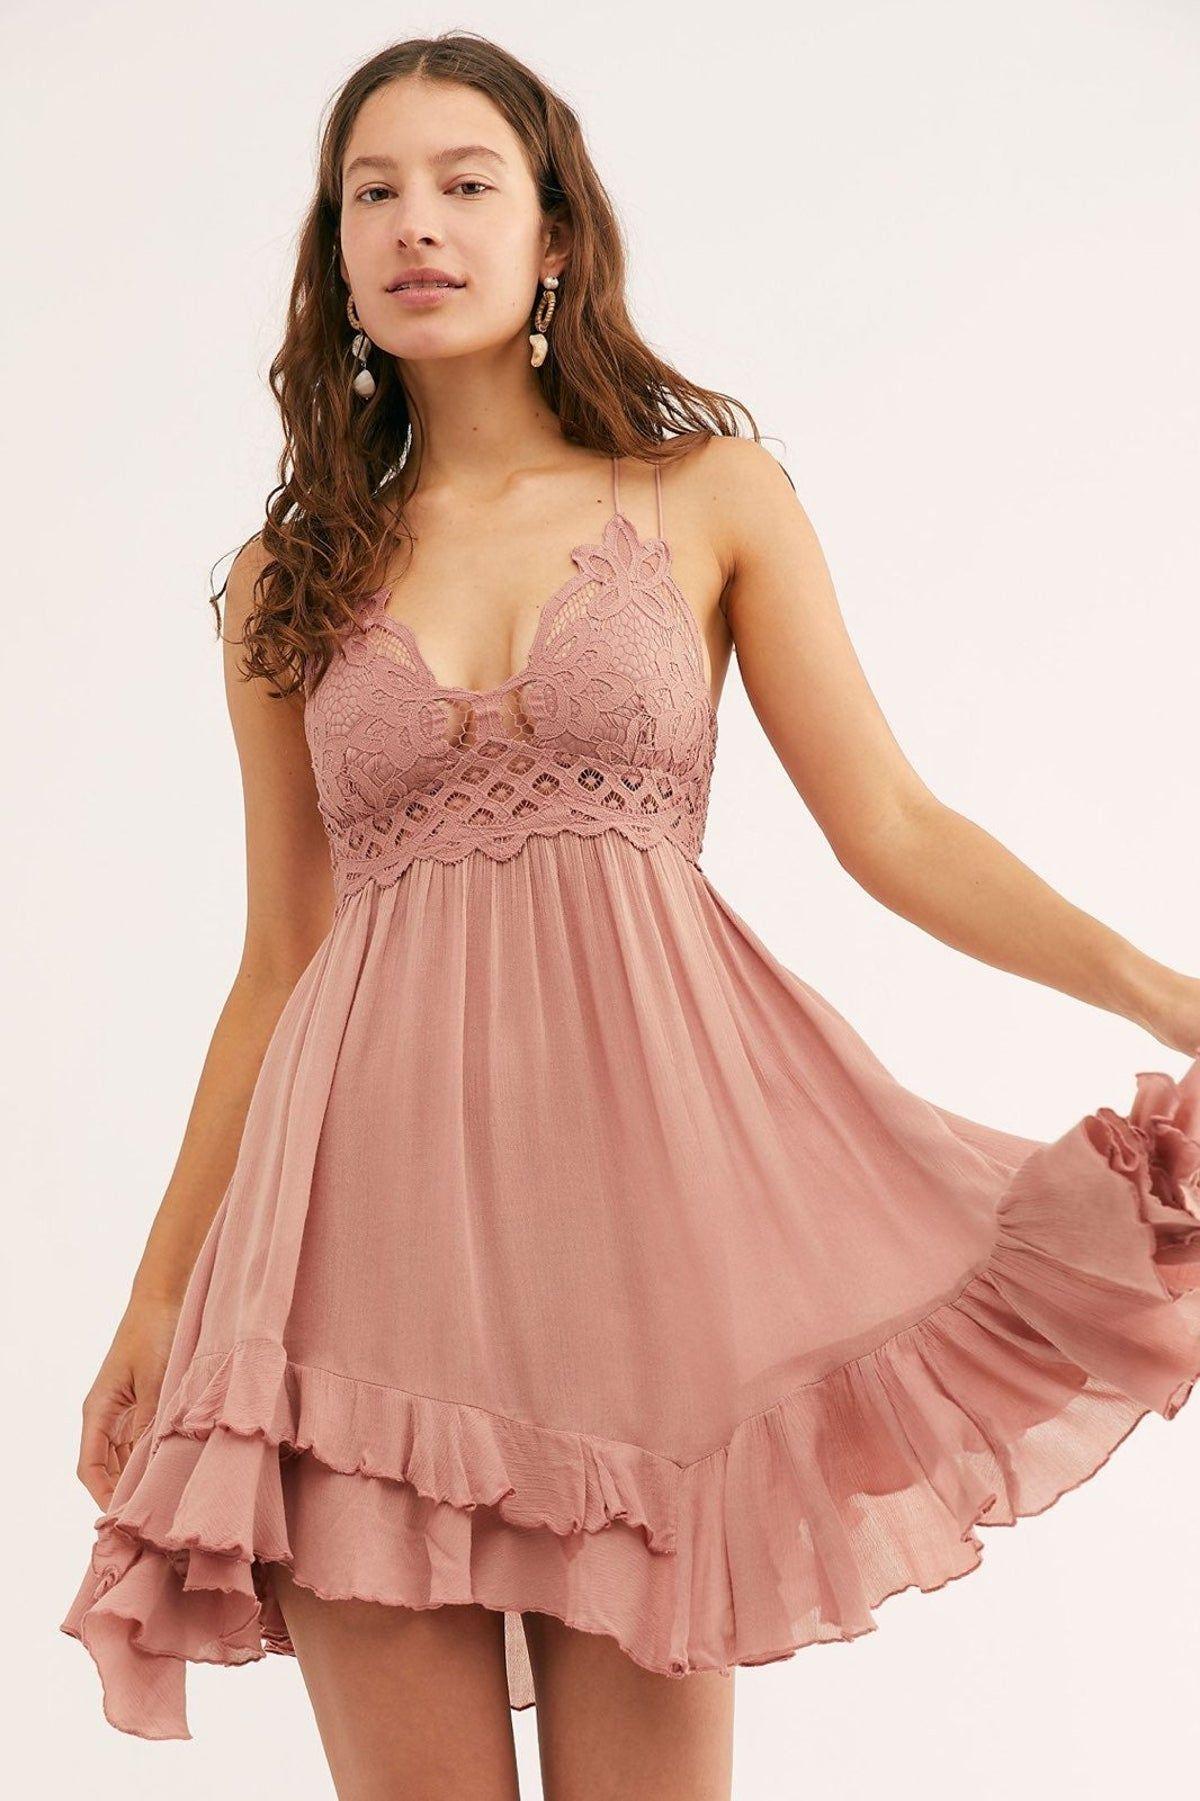 Free People Dress Fancy Dress For Kids Short Dresses Casual Casual Dresses [ 1801 x 1200 Pixel ]